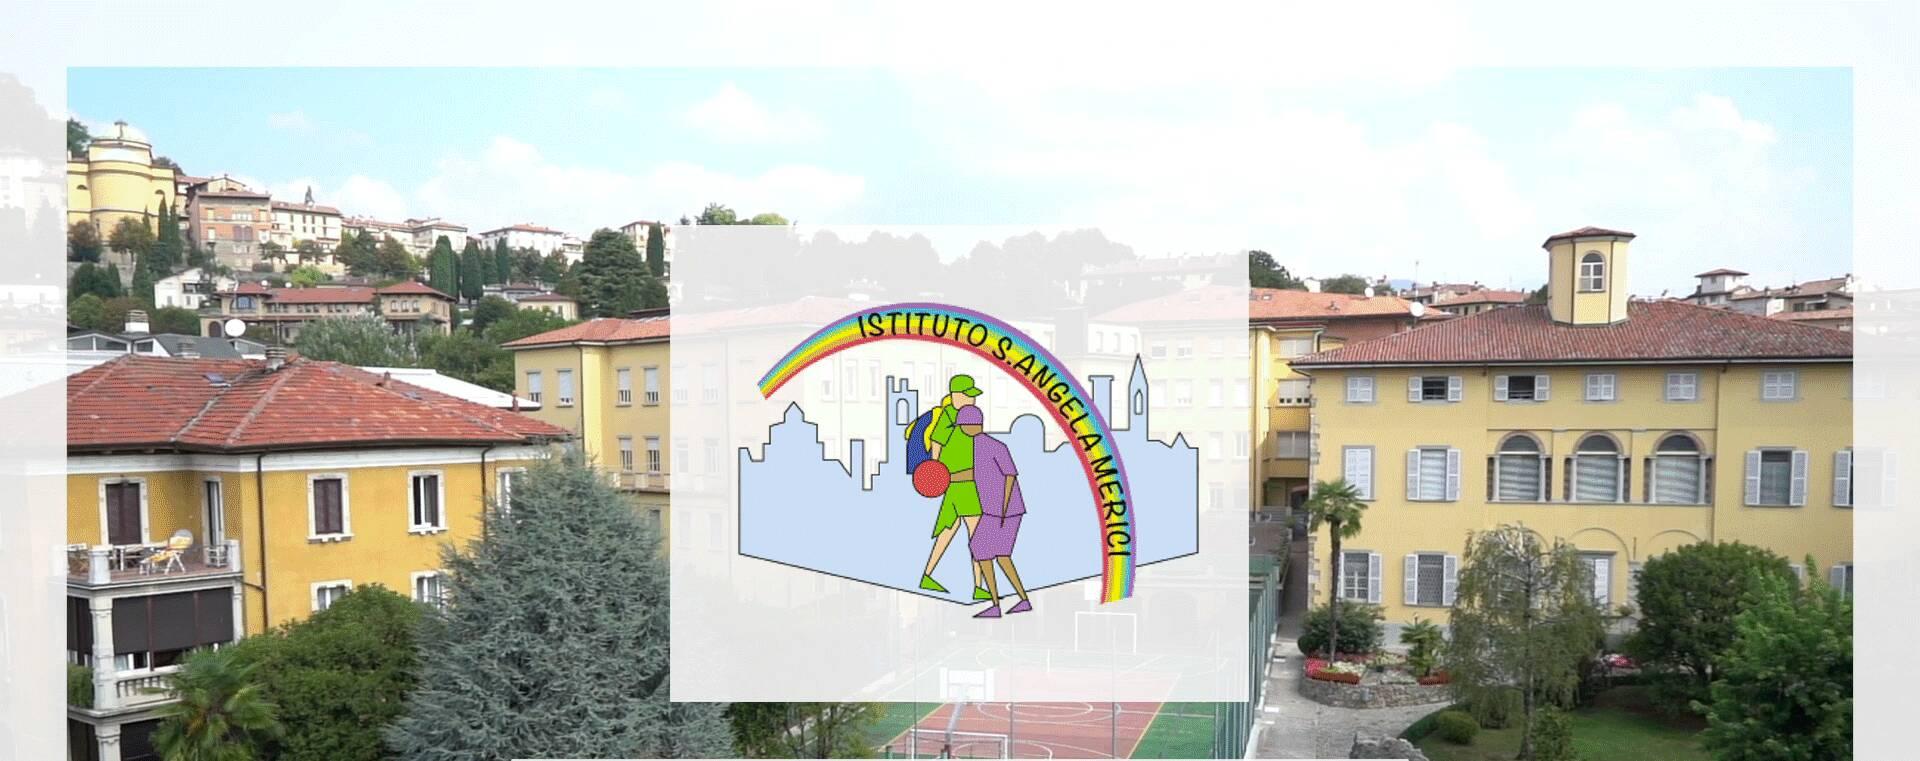 Istituto sant'Angela Merici